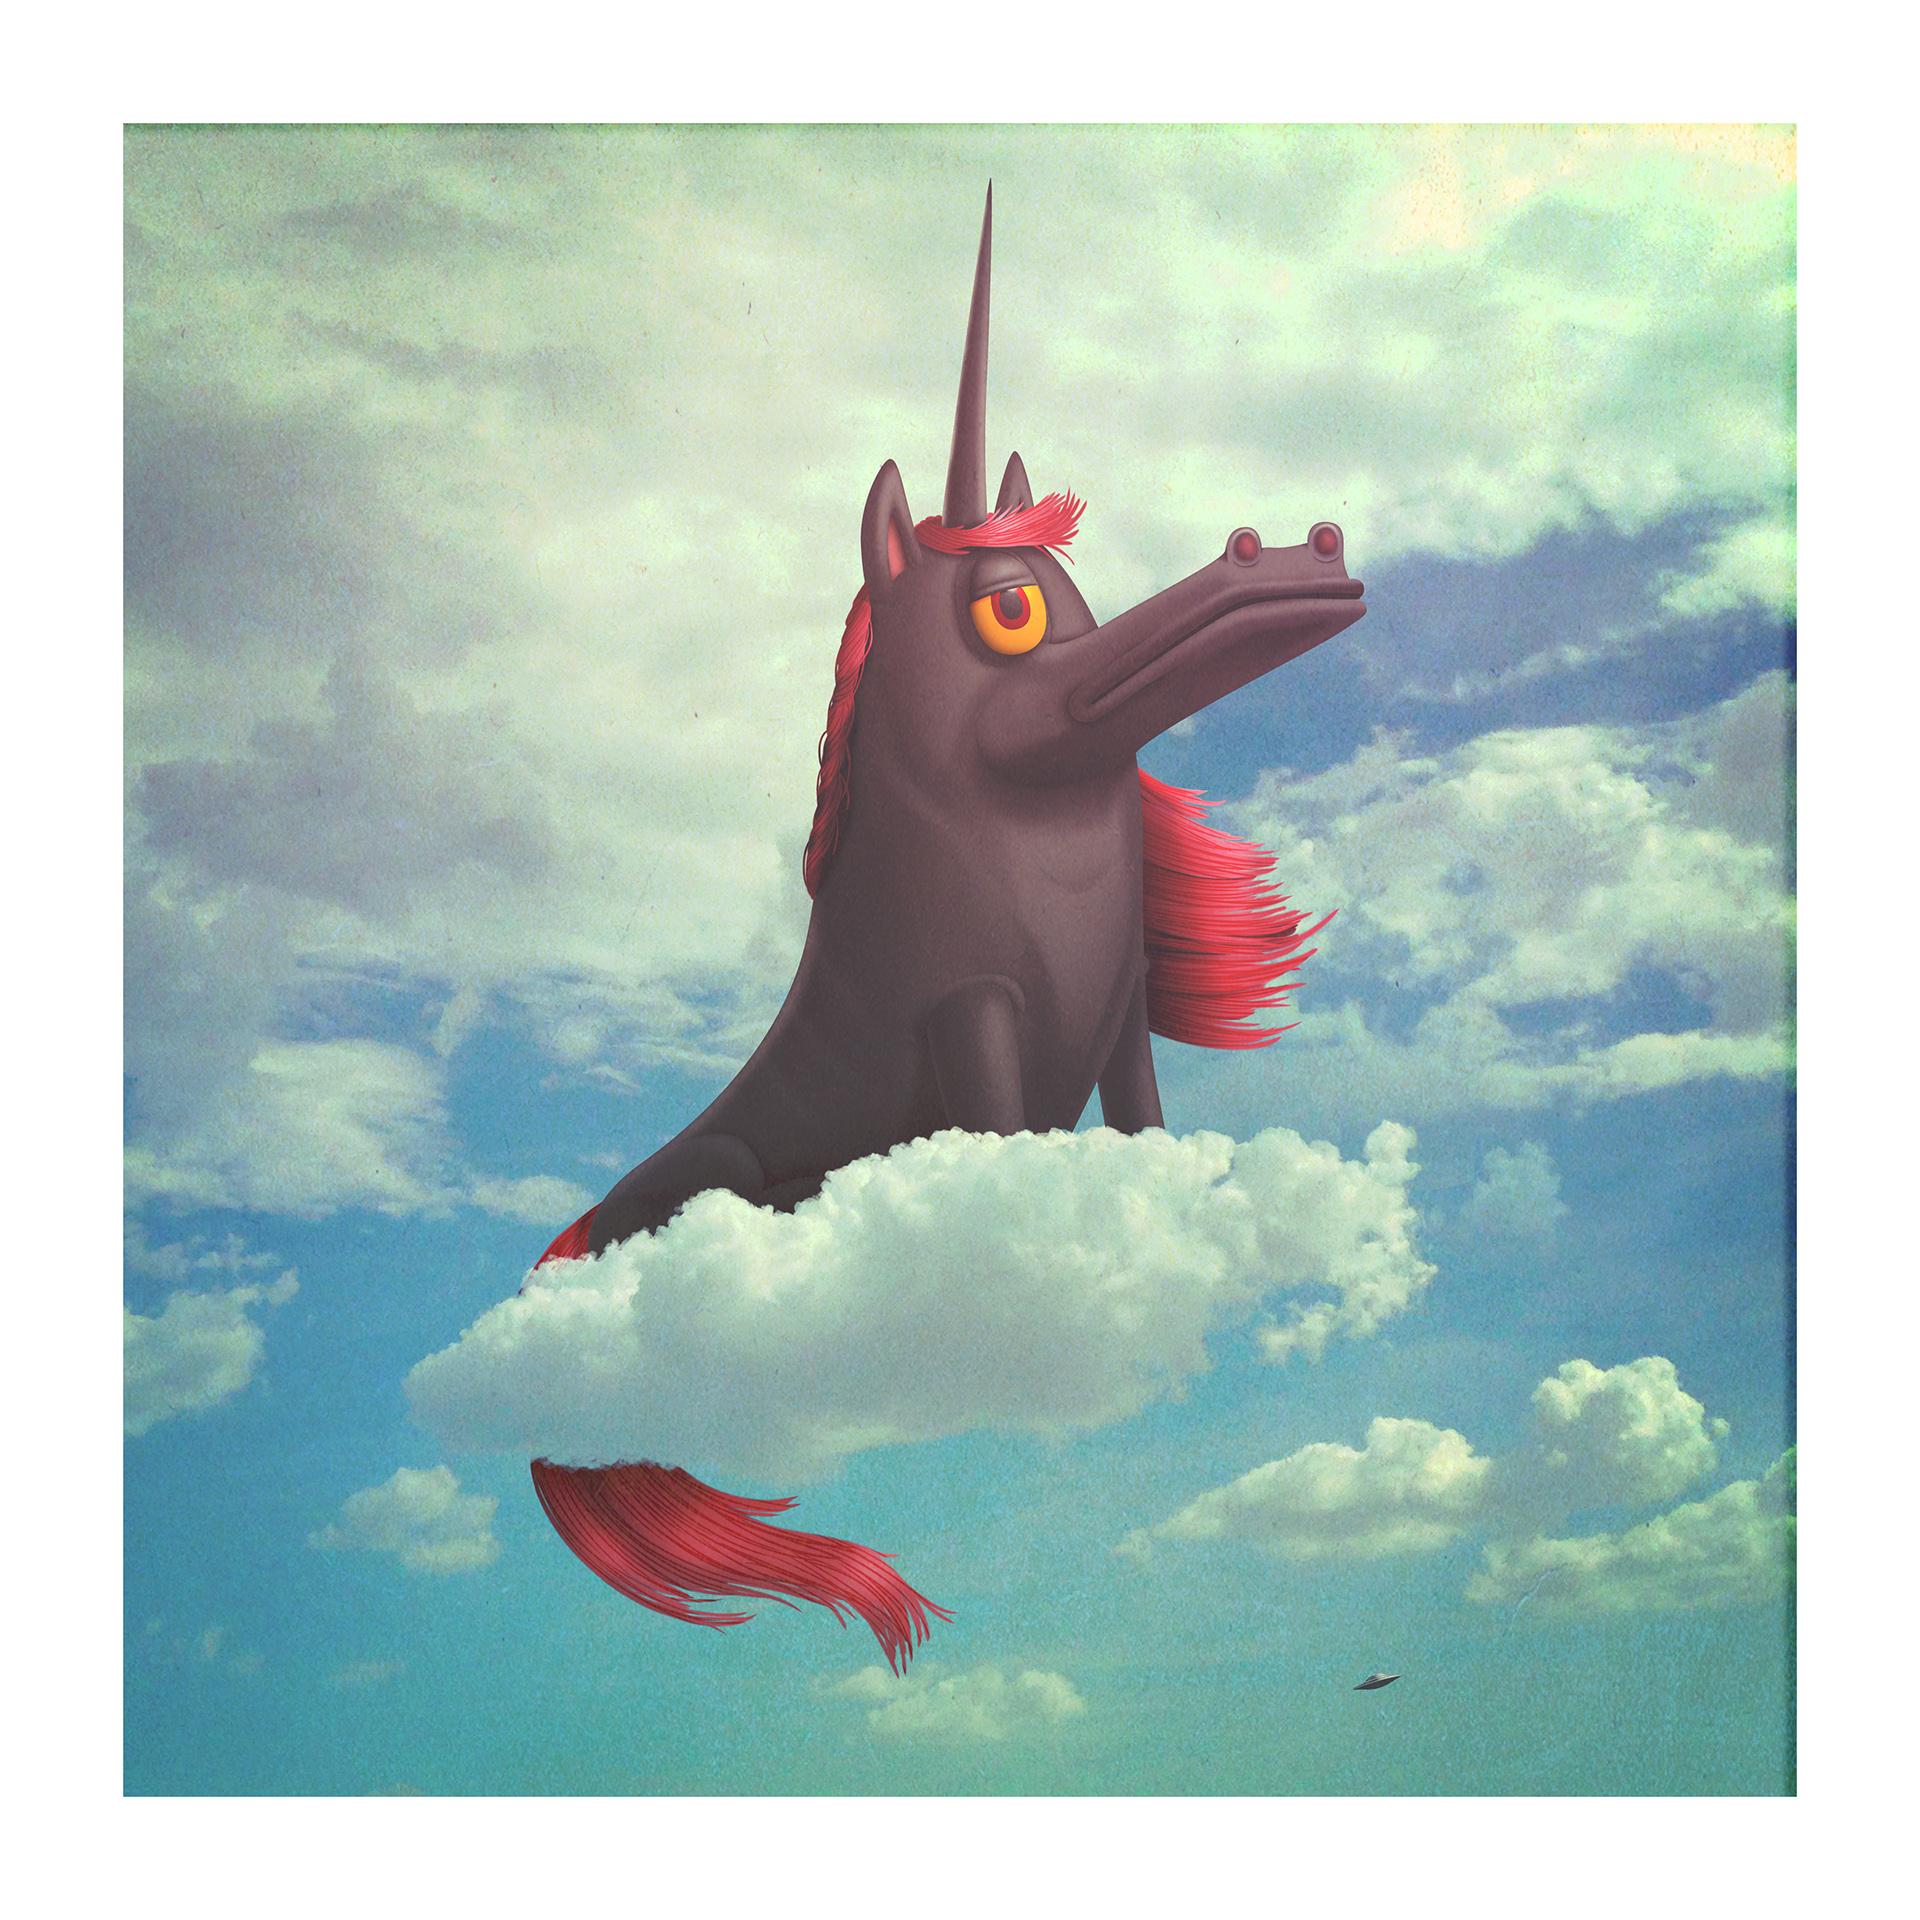 vintage inspired art funny unicorn